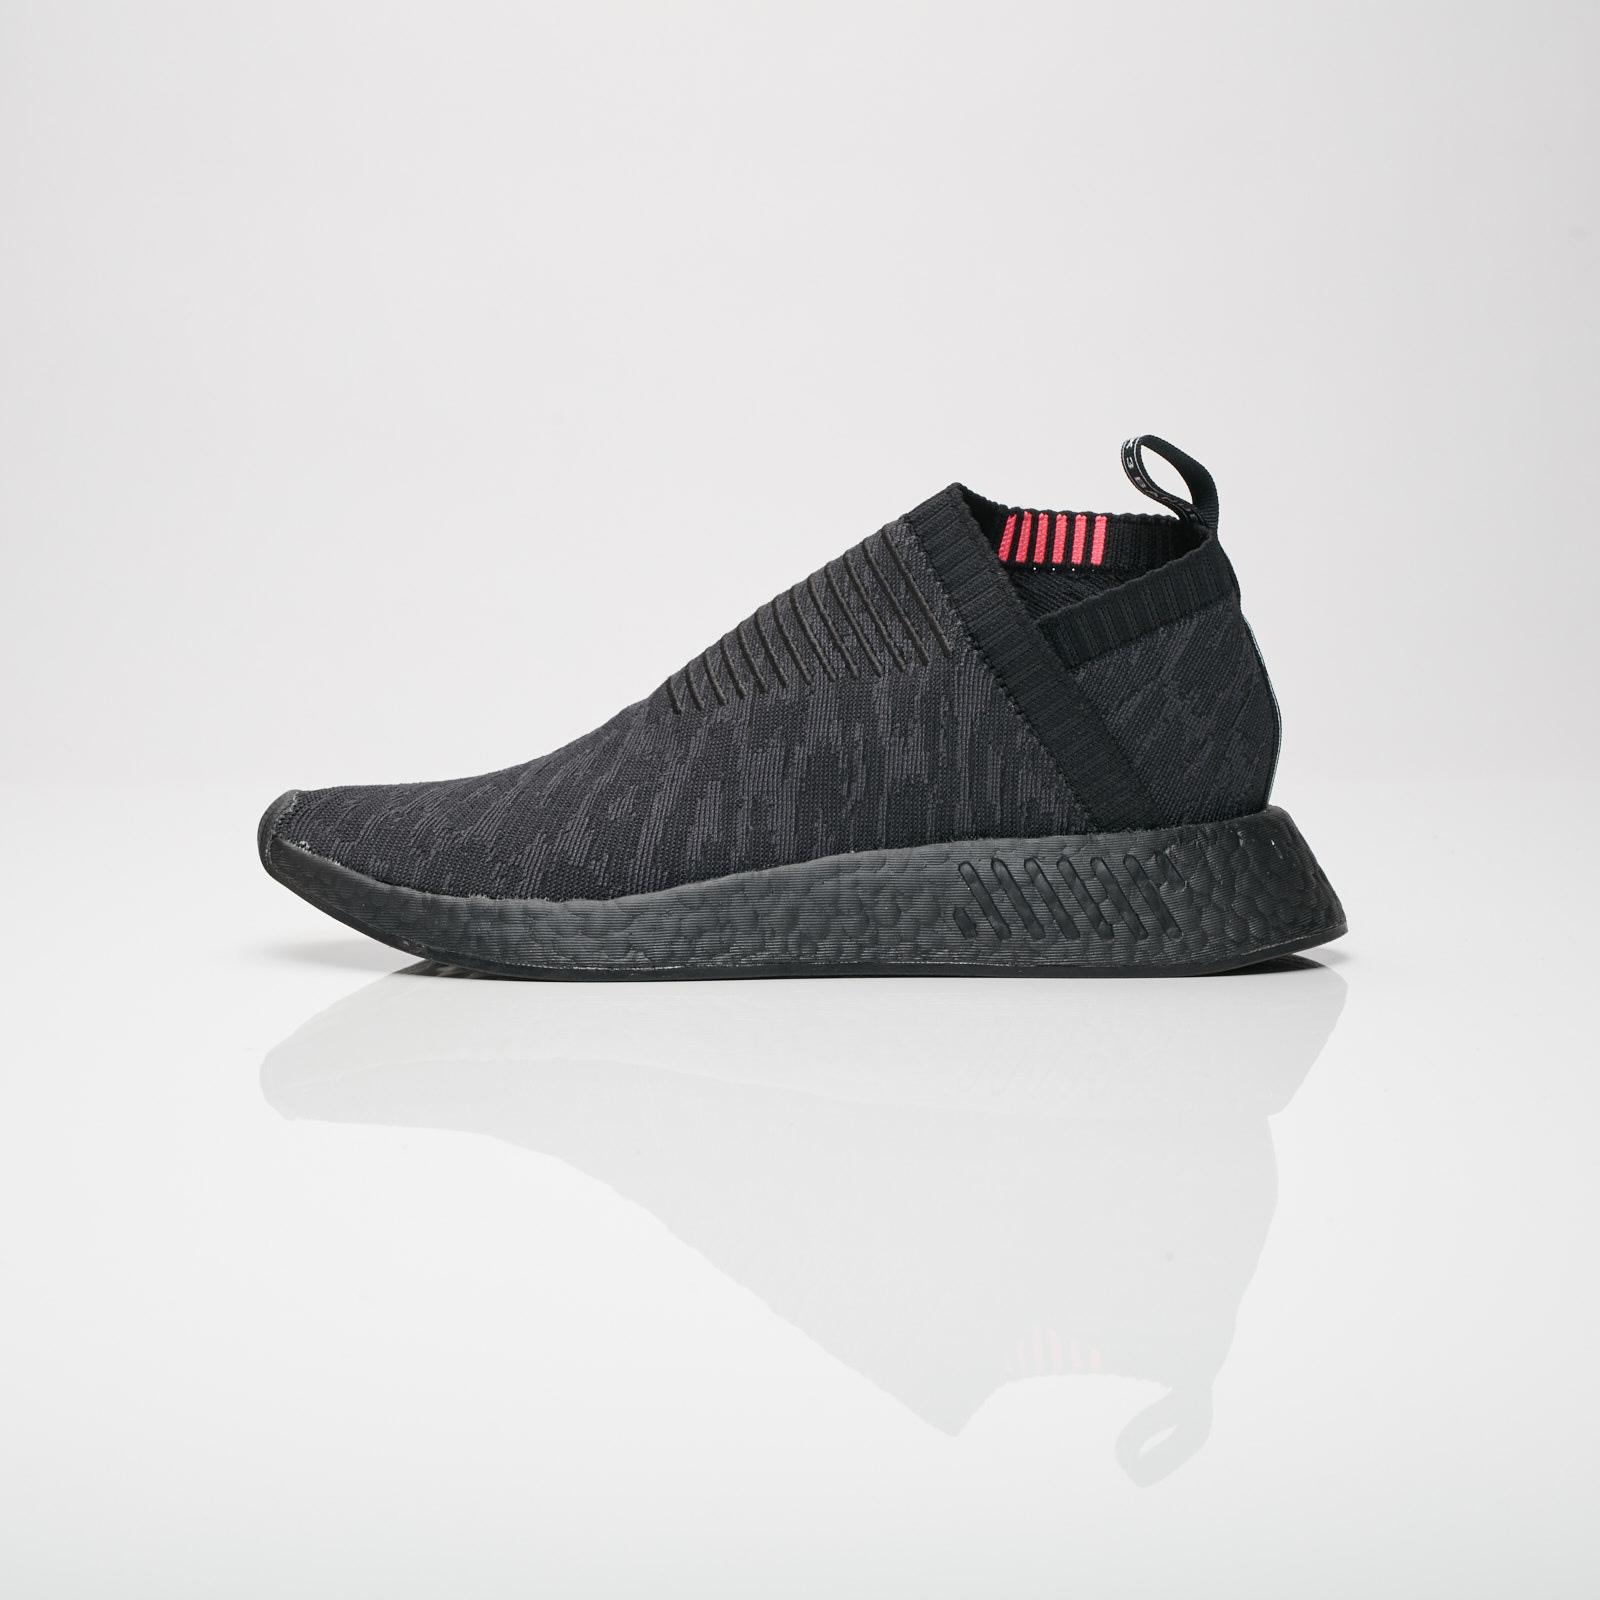 adidas NMD CS2 PK Cq2373 Sneakersnstuff | sneakers